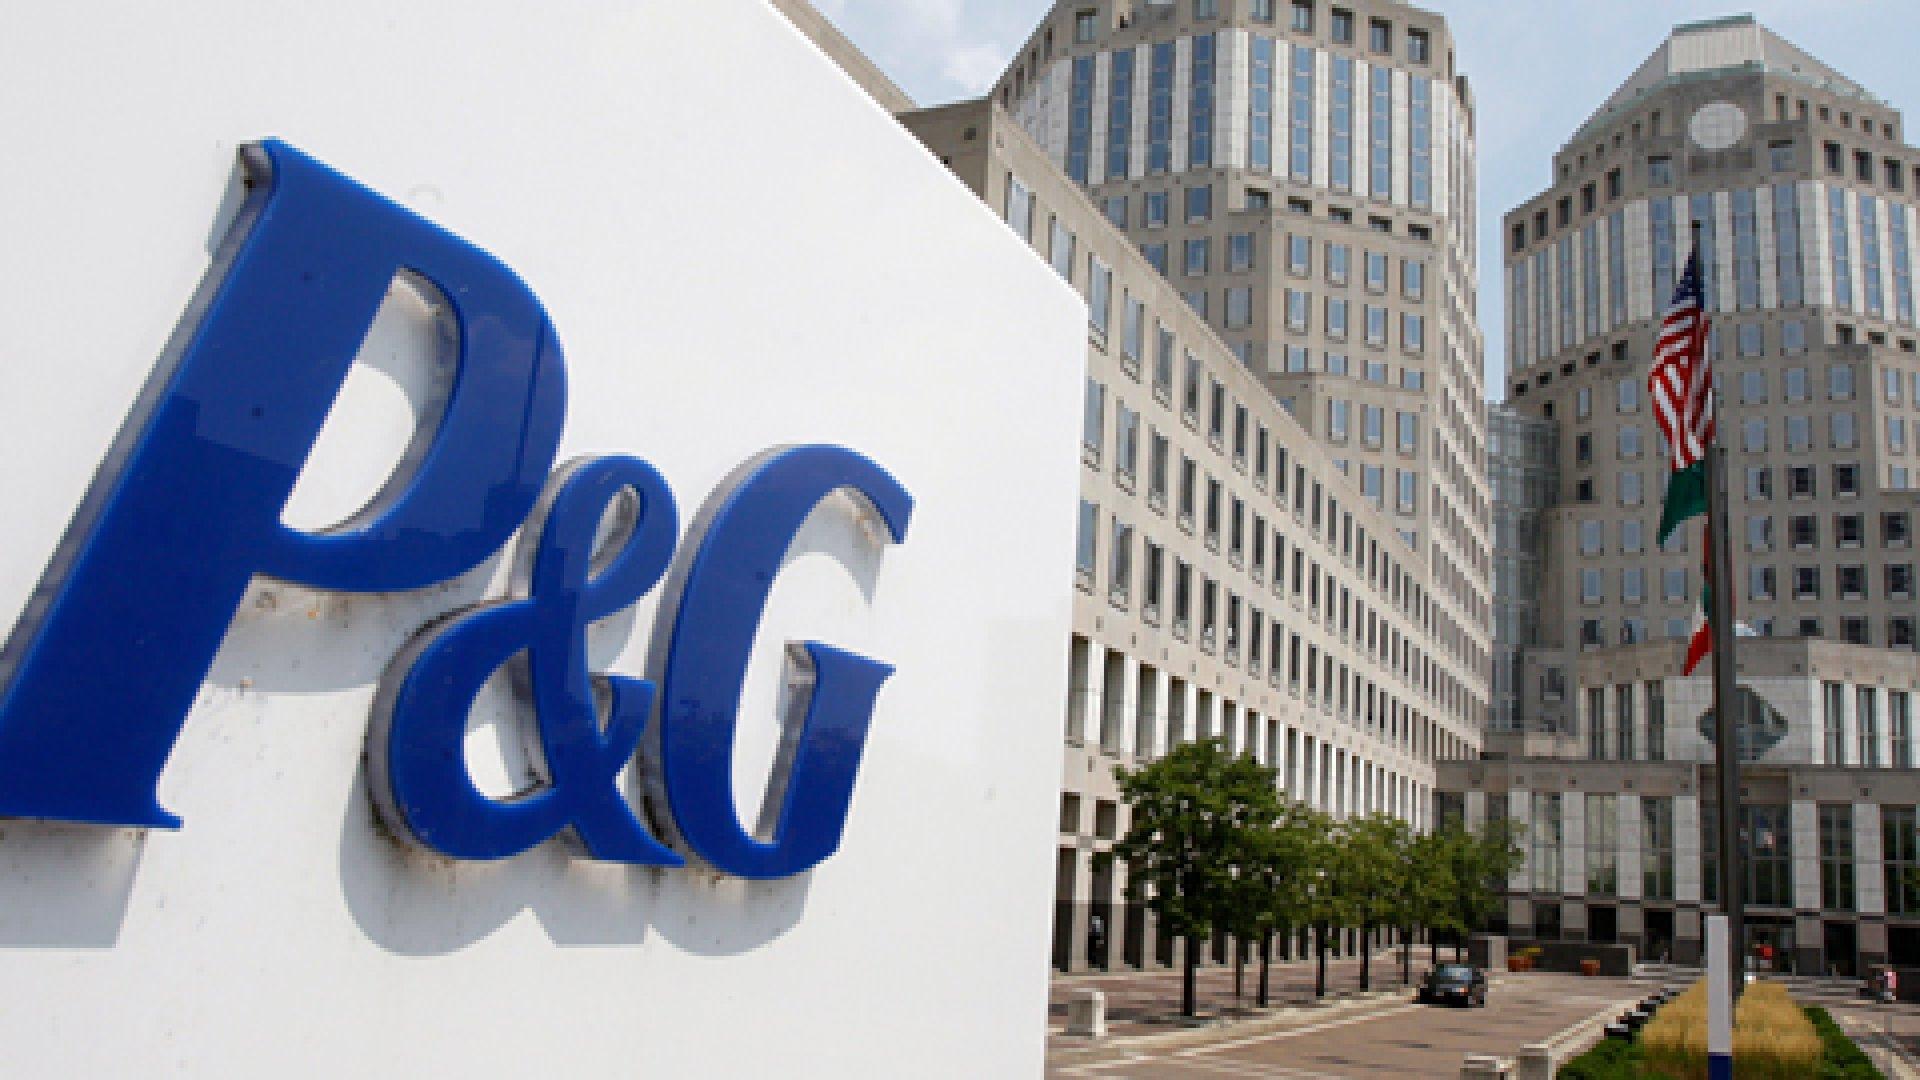 Procter & Gamble Co. headquarters building in Cincinnati